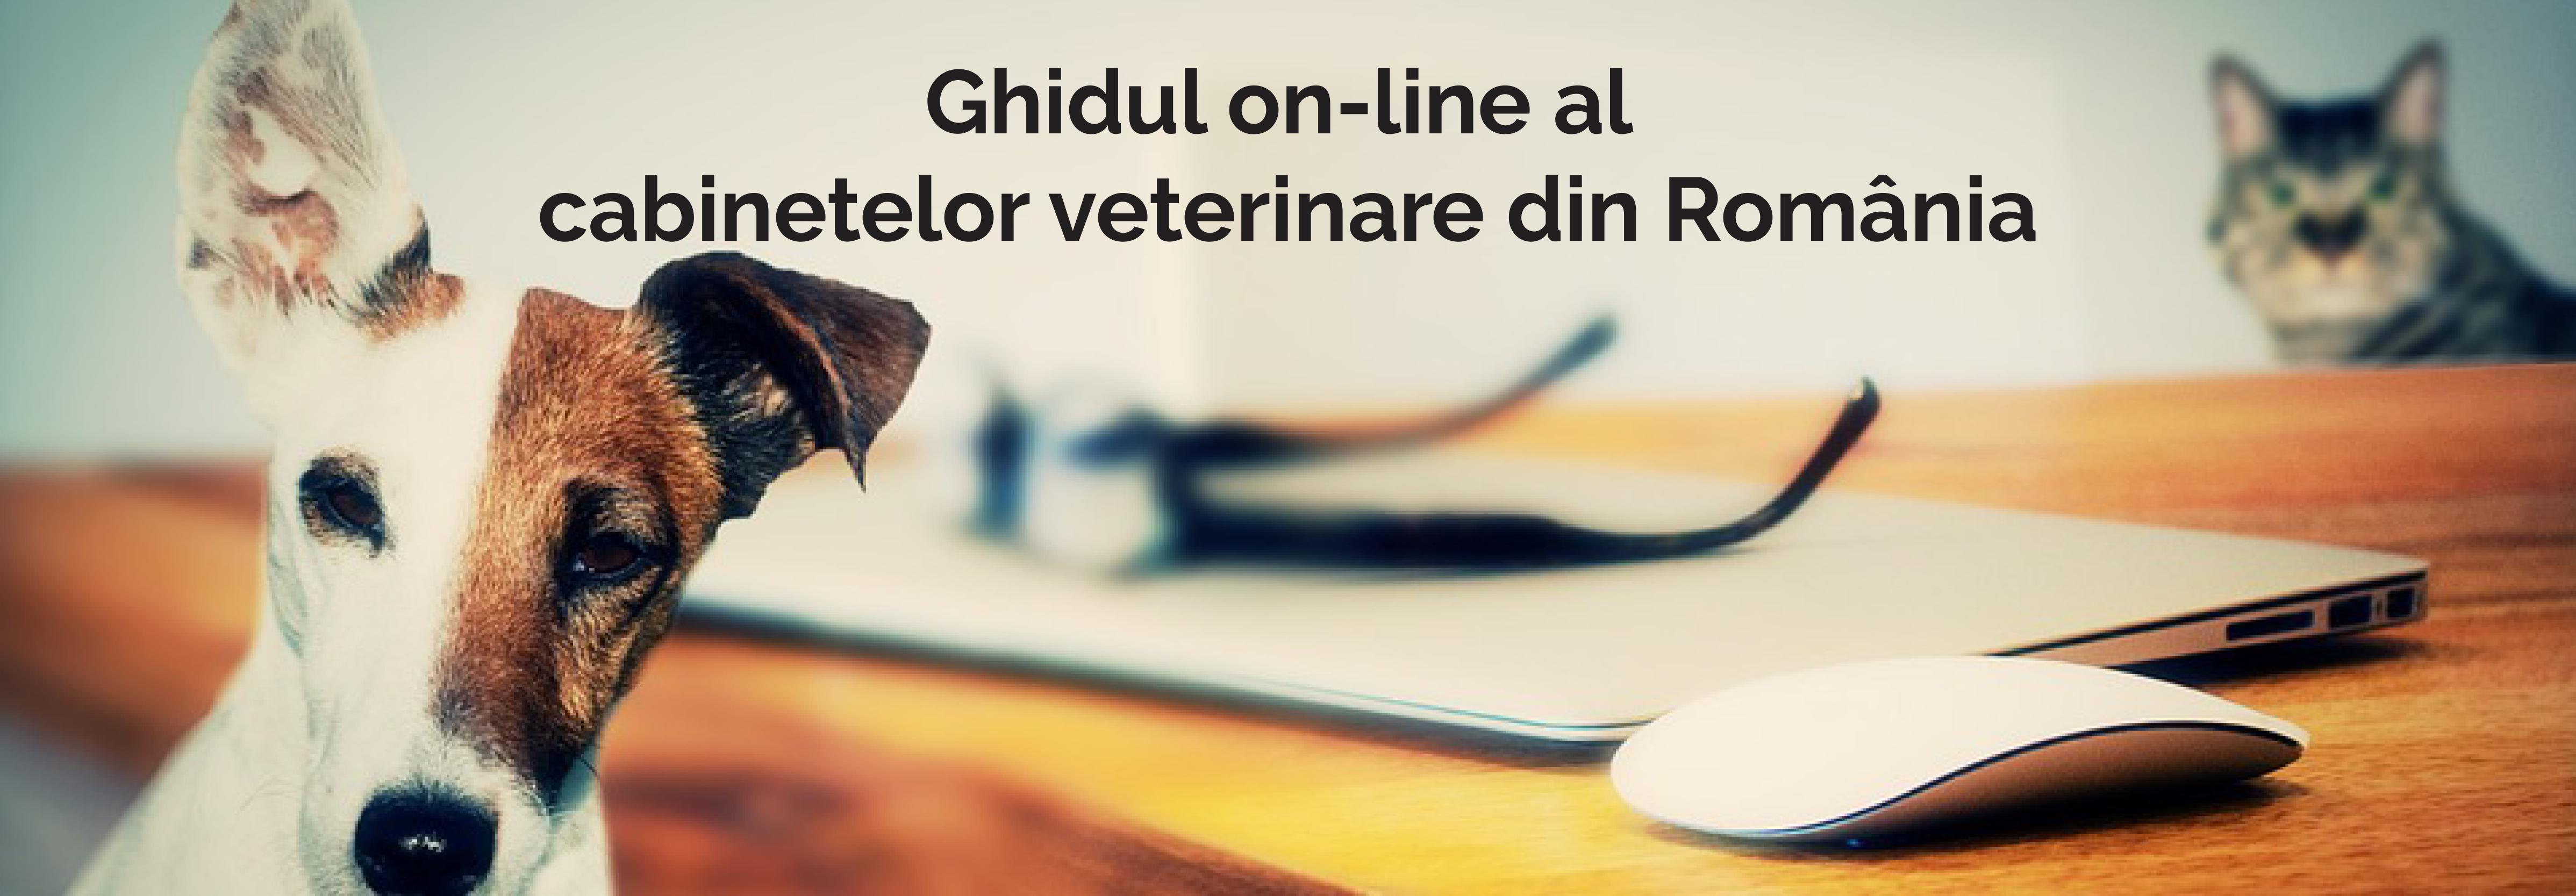 banner-ghidul-veterinarului-v2-1ok